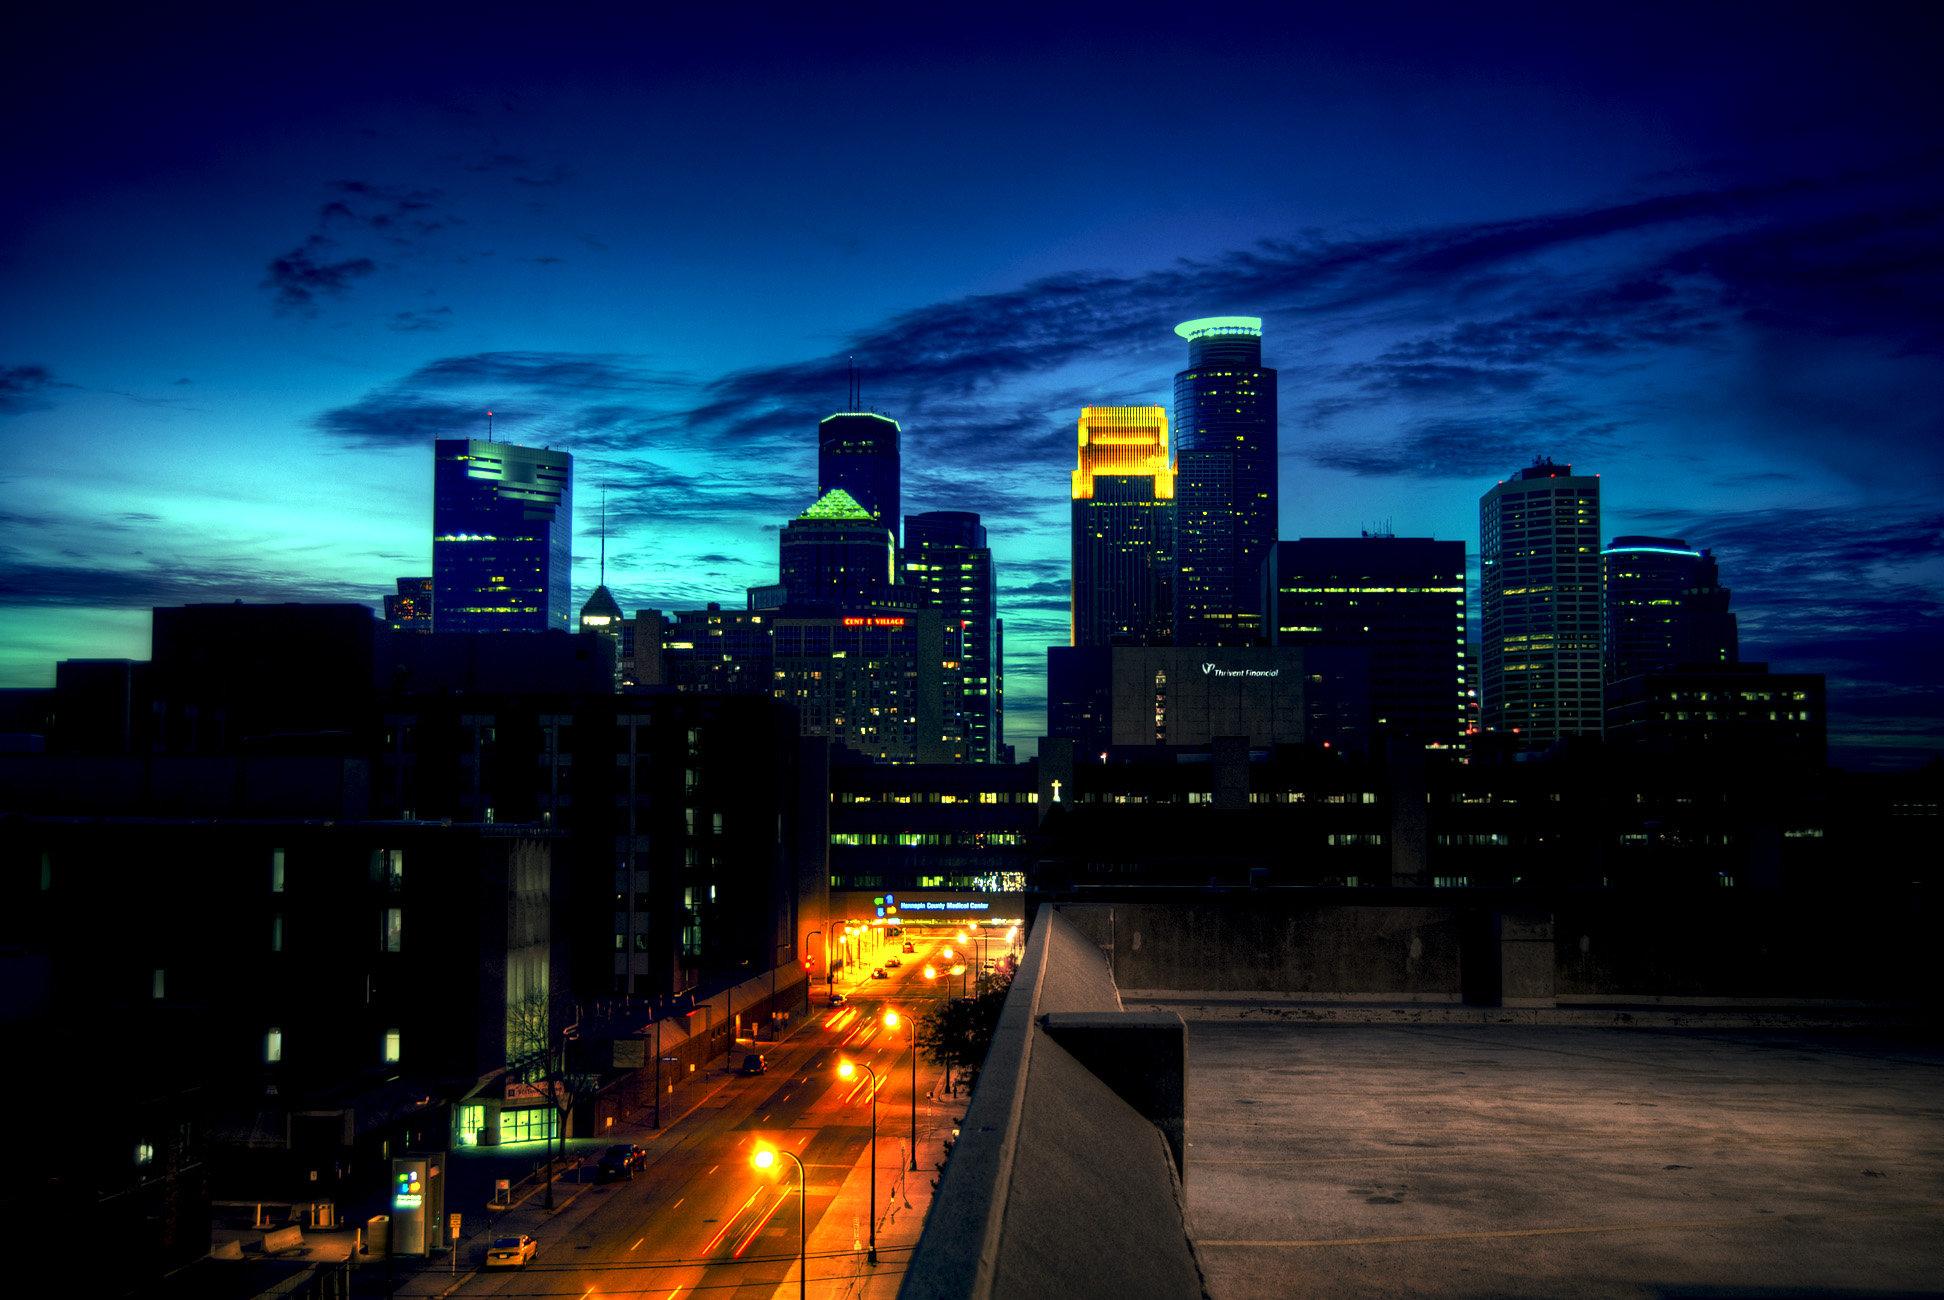 Minneapolis Skyline At Dusk By TheSalmonThief 1944x1300